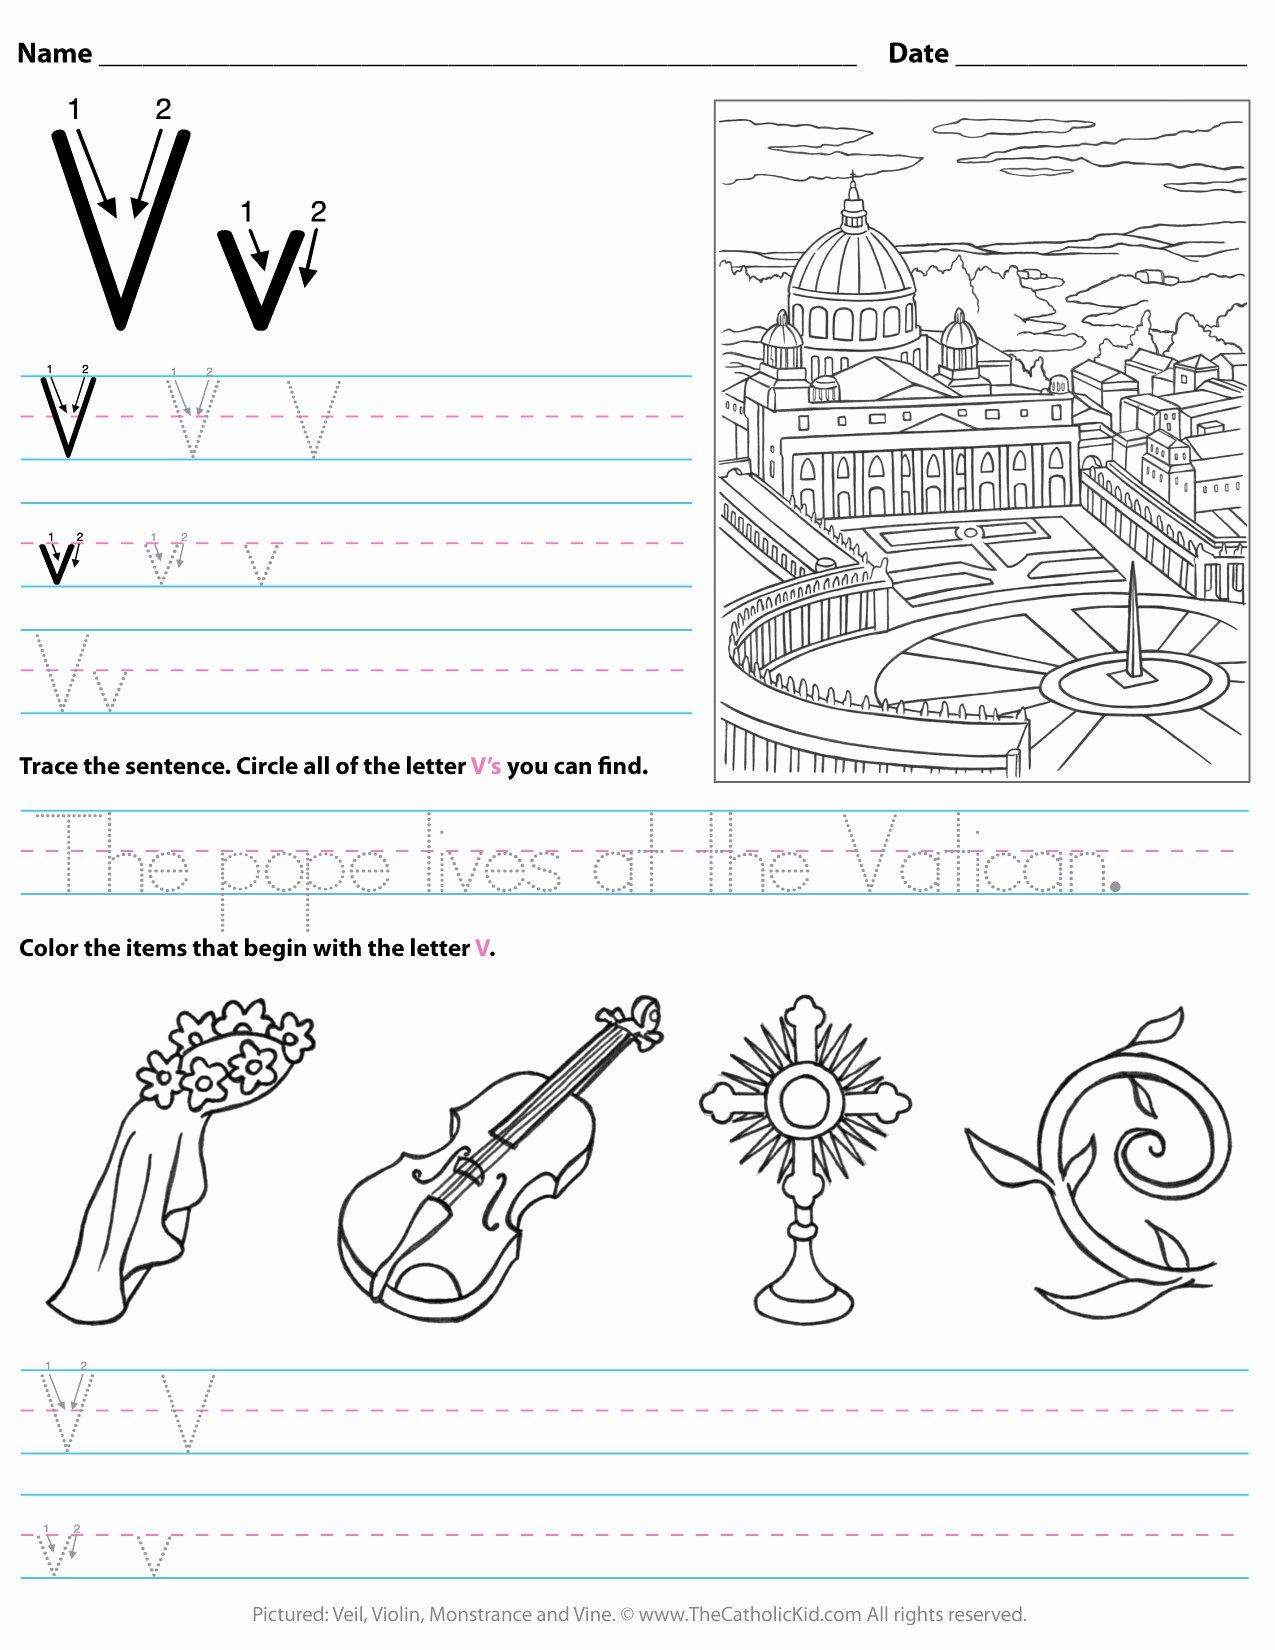 V Worksheets for Preschoolers Best Of Catholic Alphabet Letter V Worksheet Preschool Kindergarten